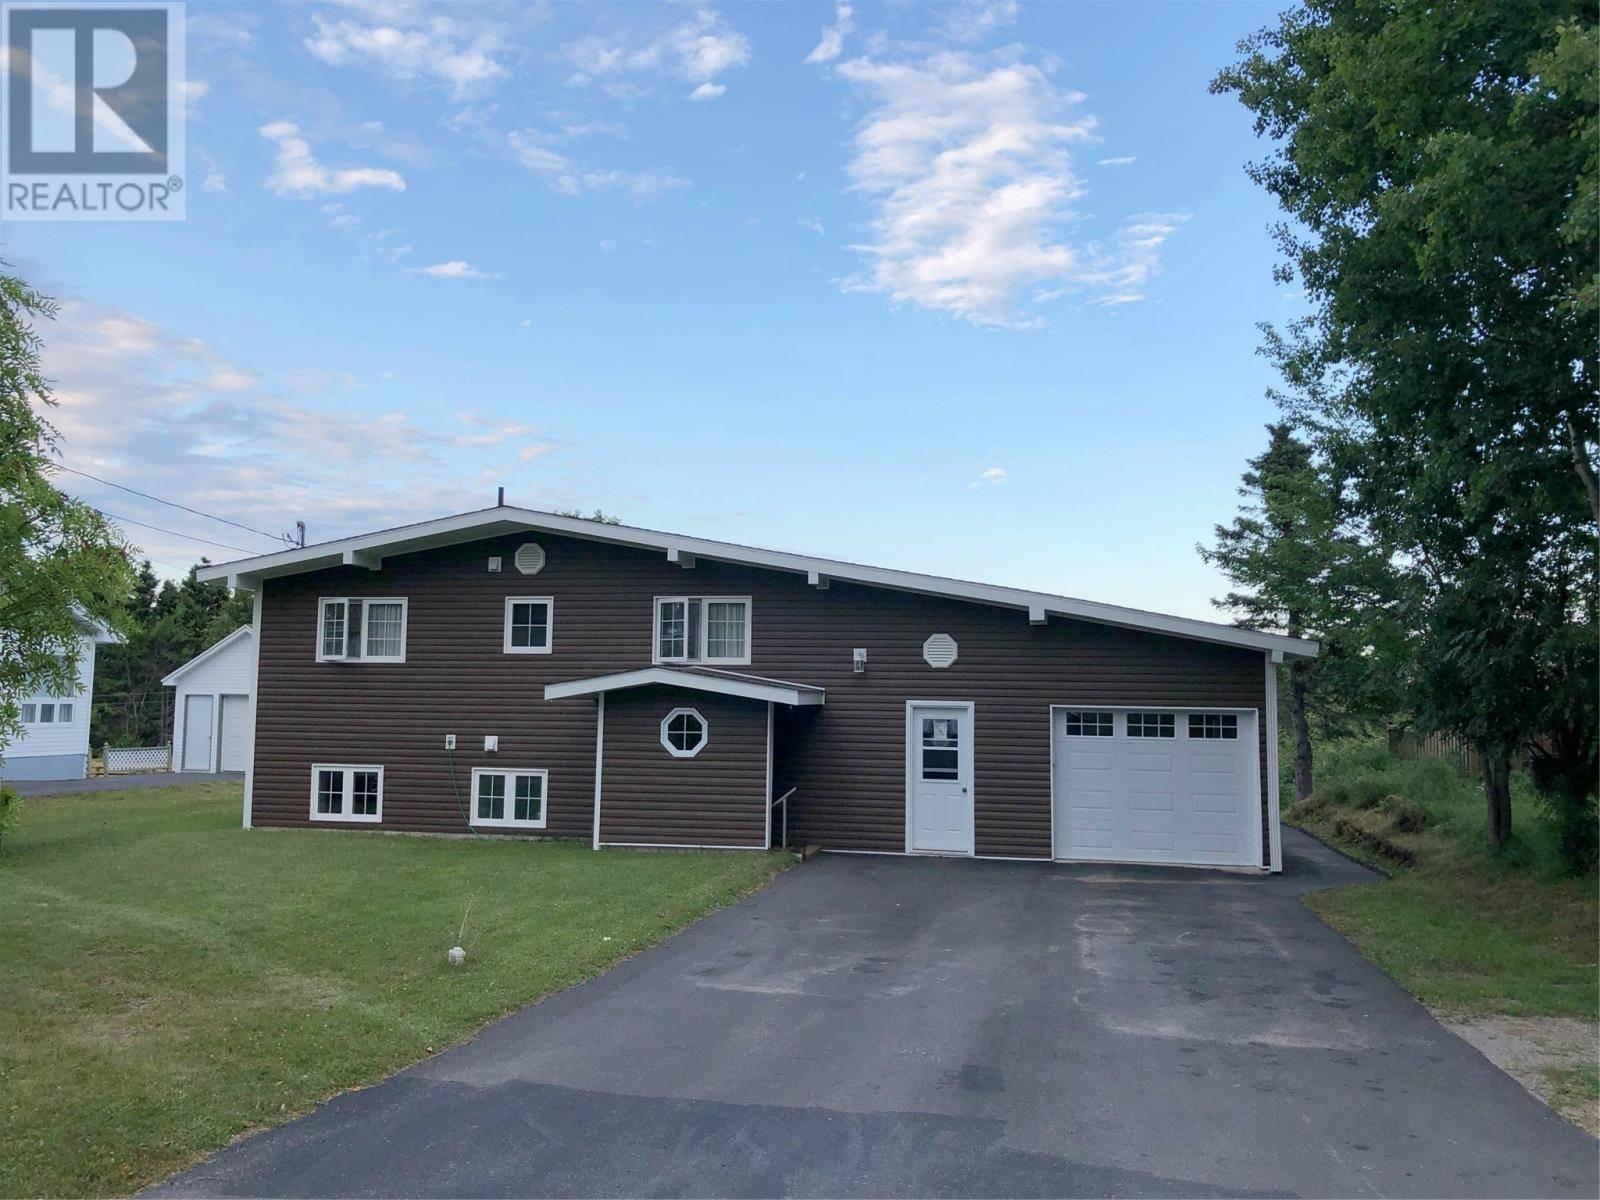 House for sale at 10 Jolie Vue Dr Glovertown Newfoundland - MLS: 1200929